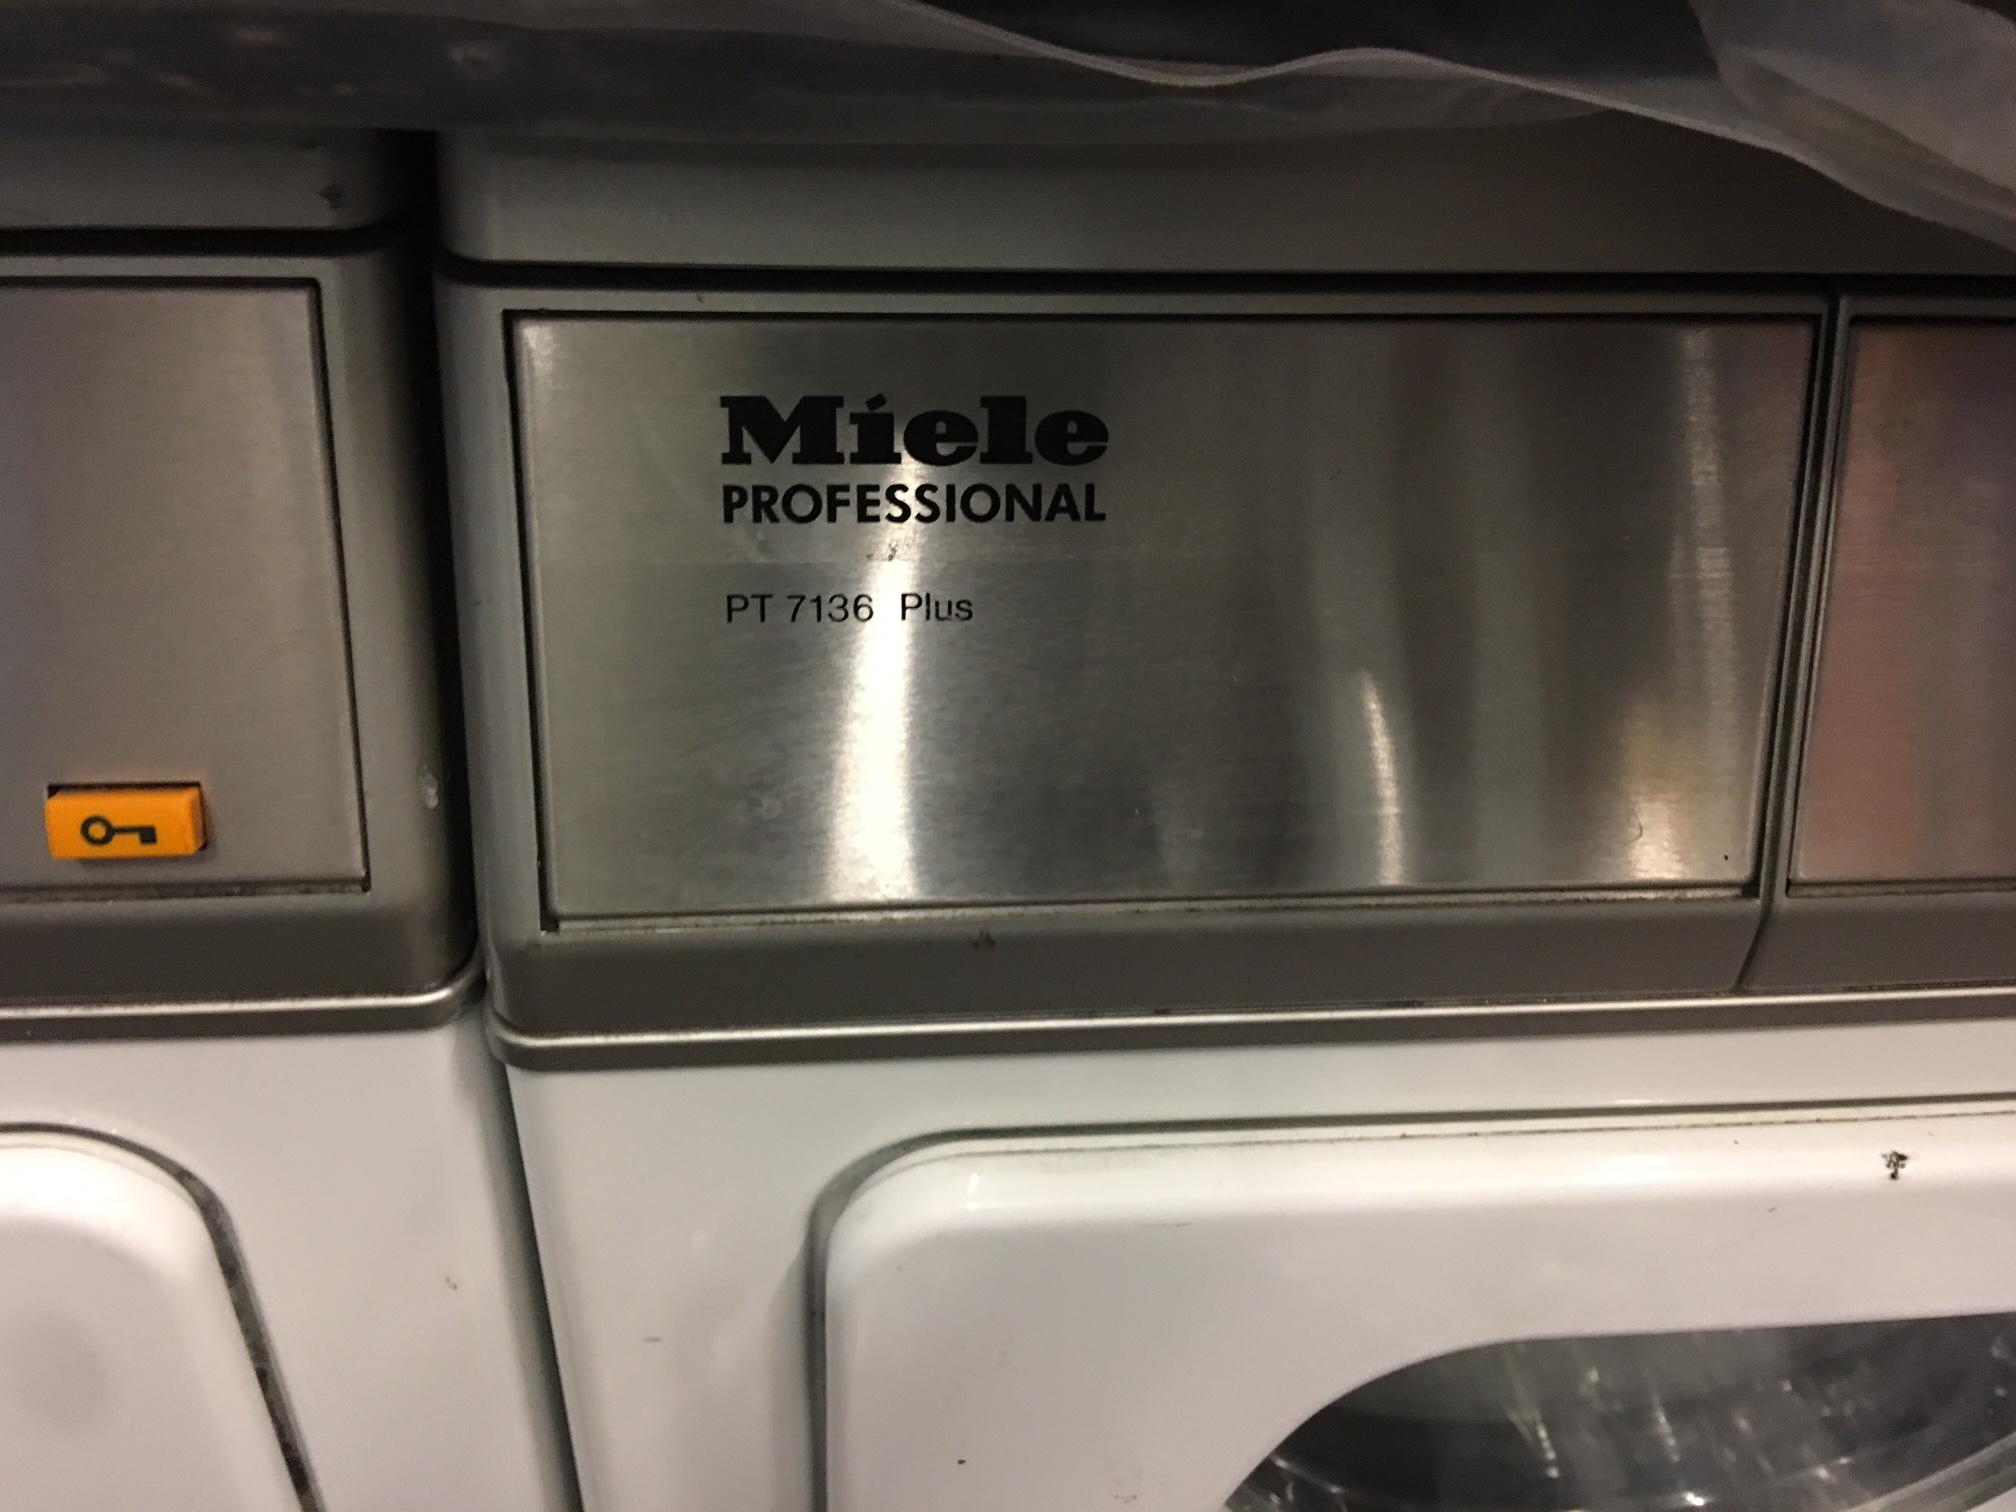 Miele professional pt7136 vario tumble dryer 3 phase - Miele professional ...